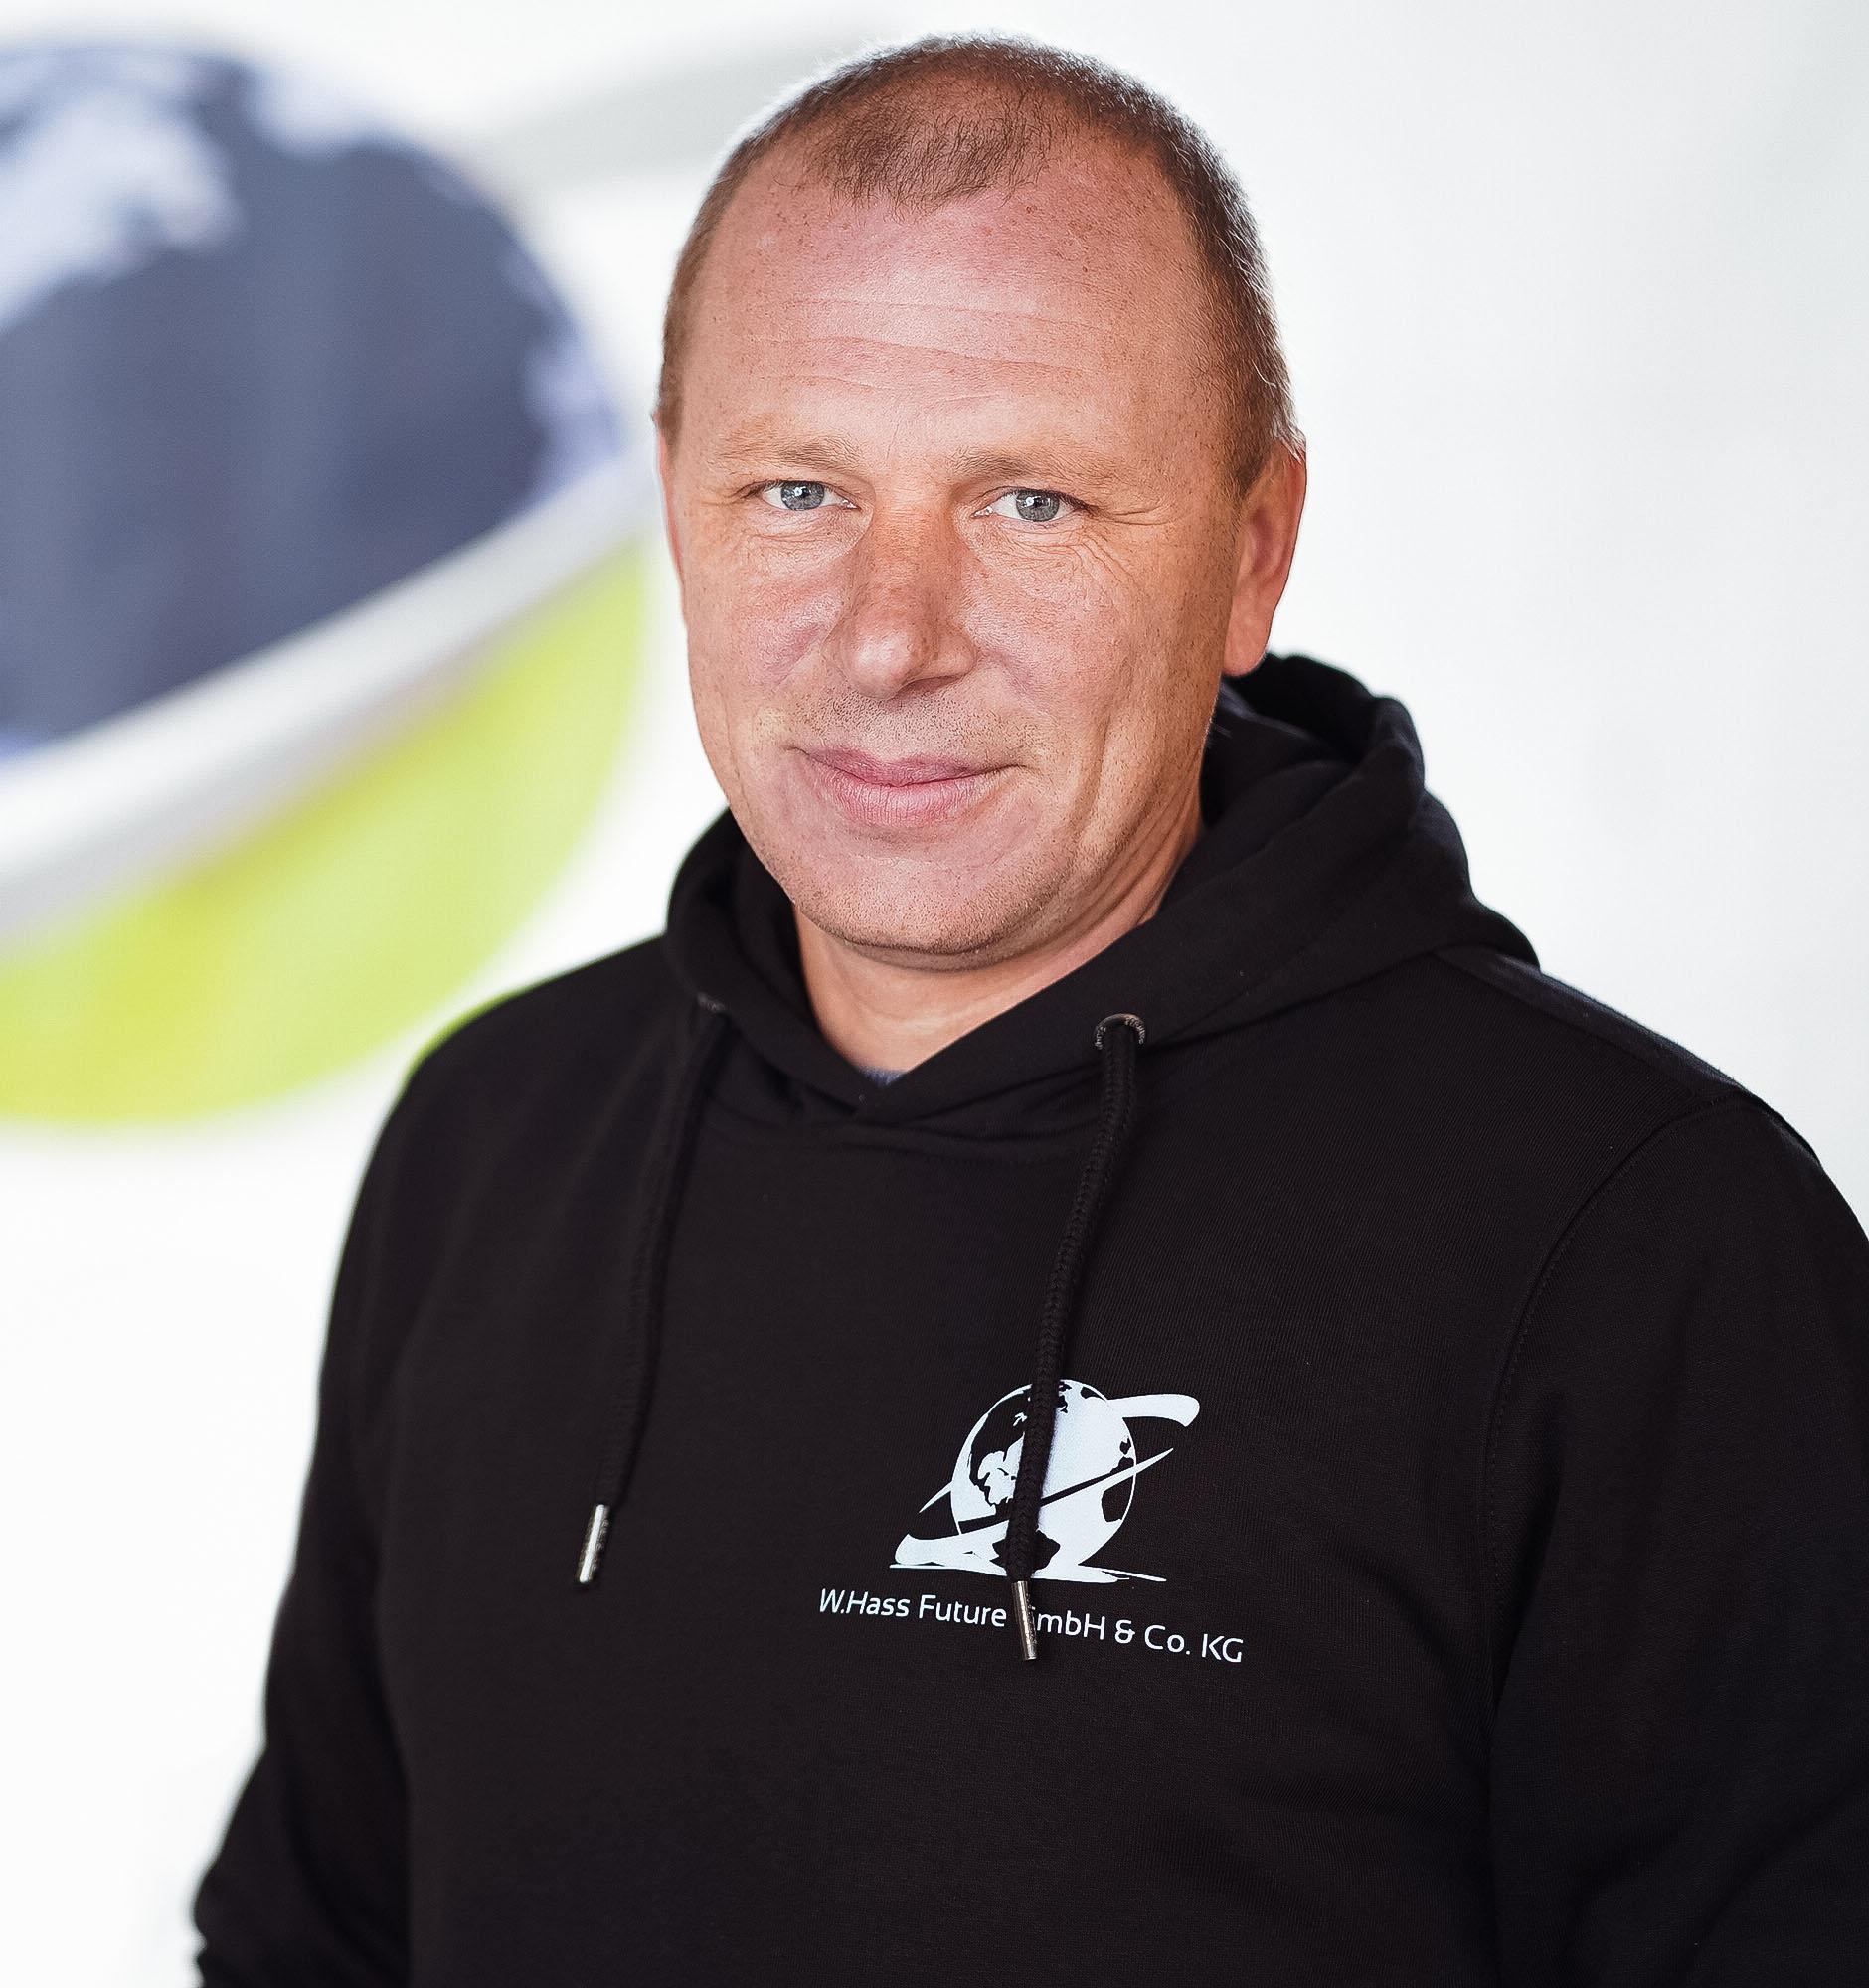 Oleg-Keil-Construction-Manager_02.jpg